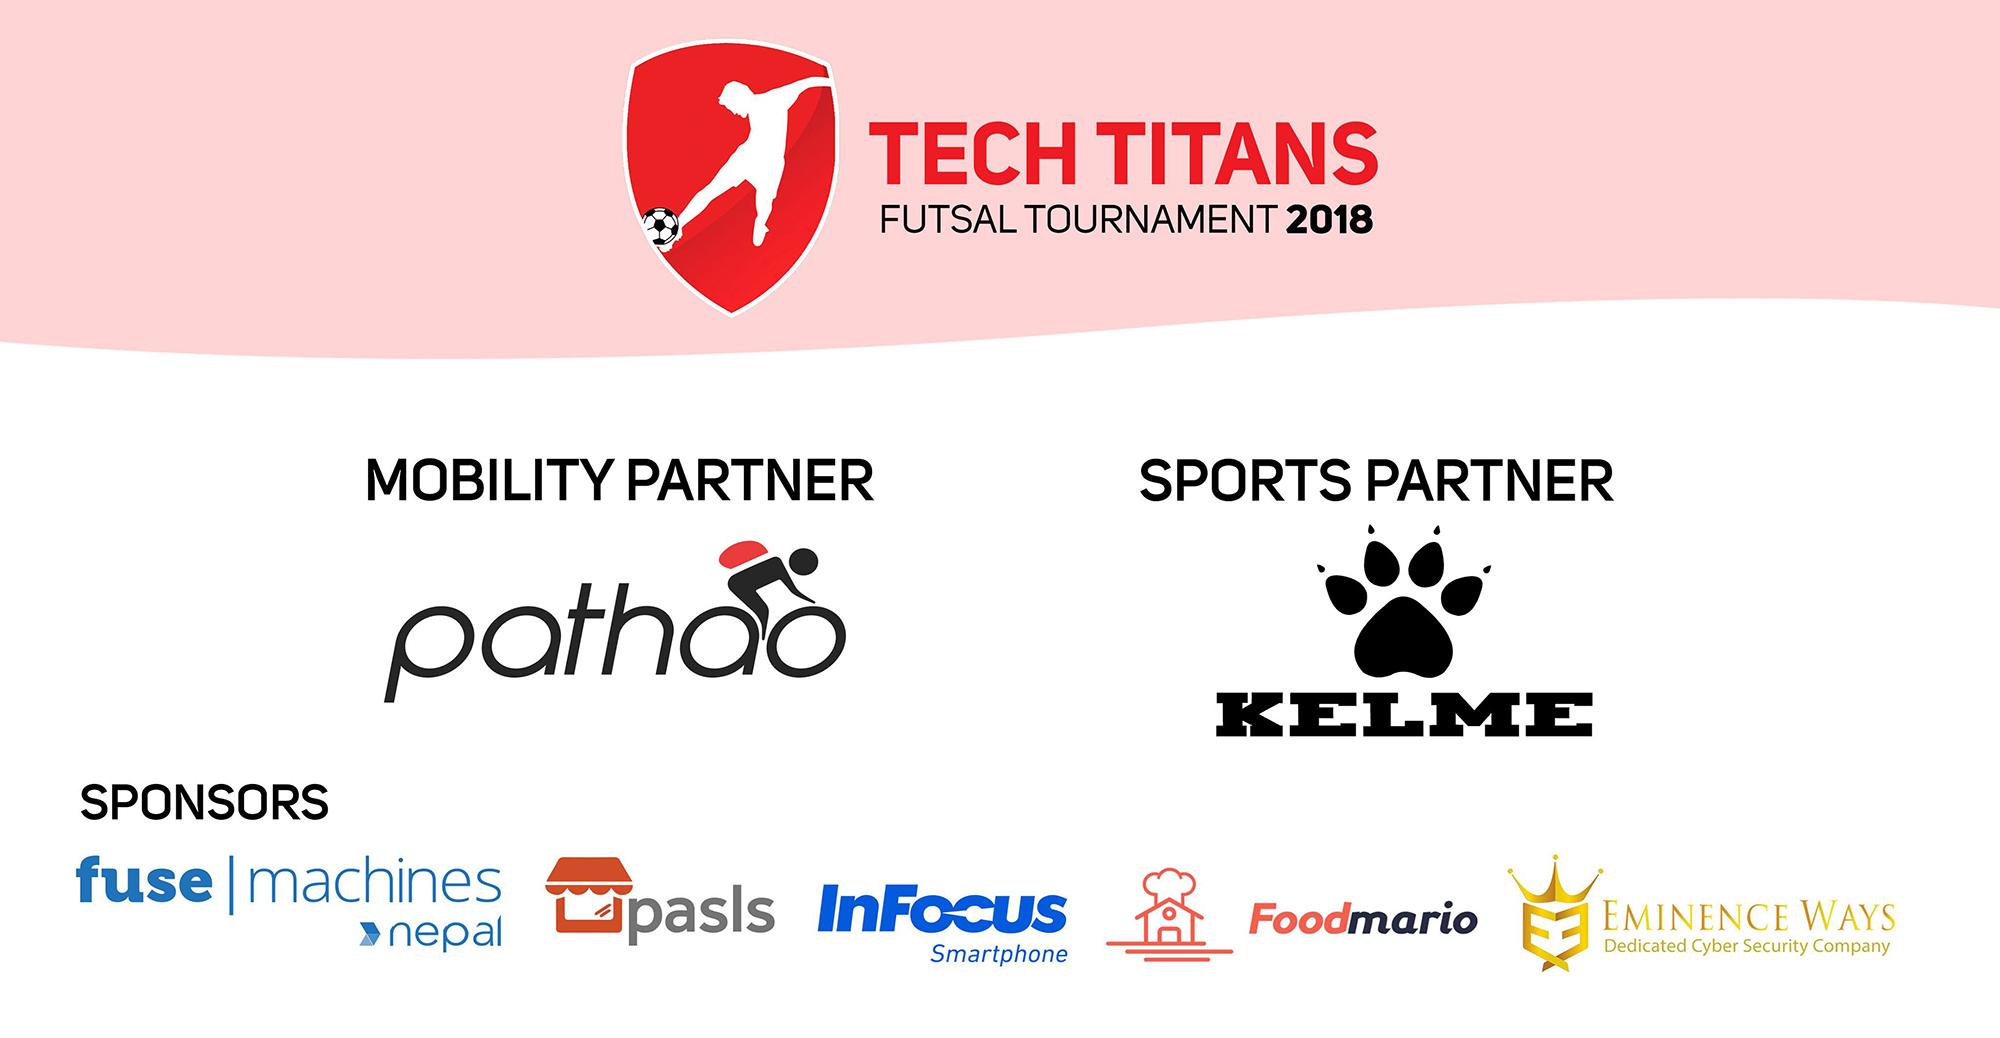 Tech Titans Futsal Tournament 2018